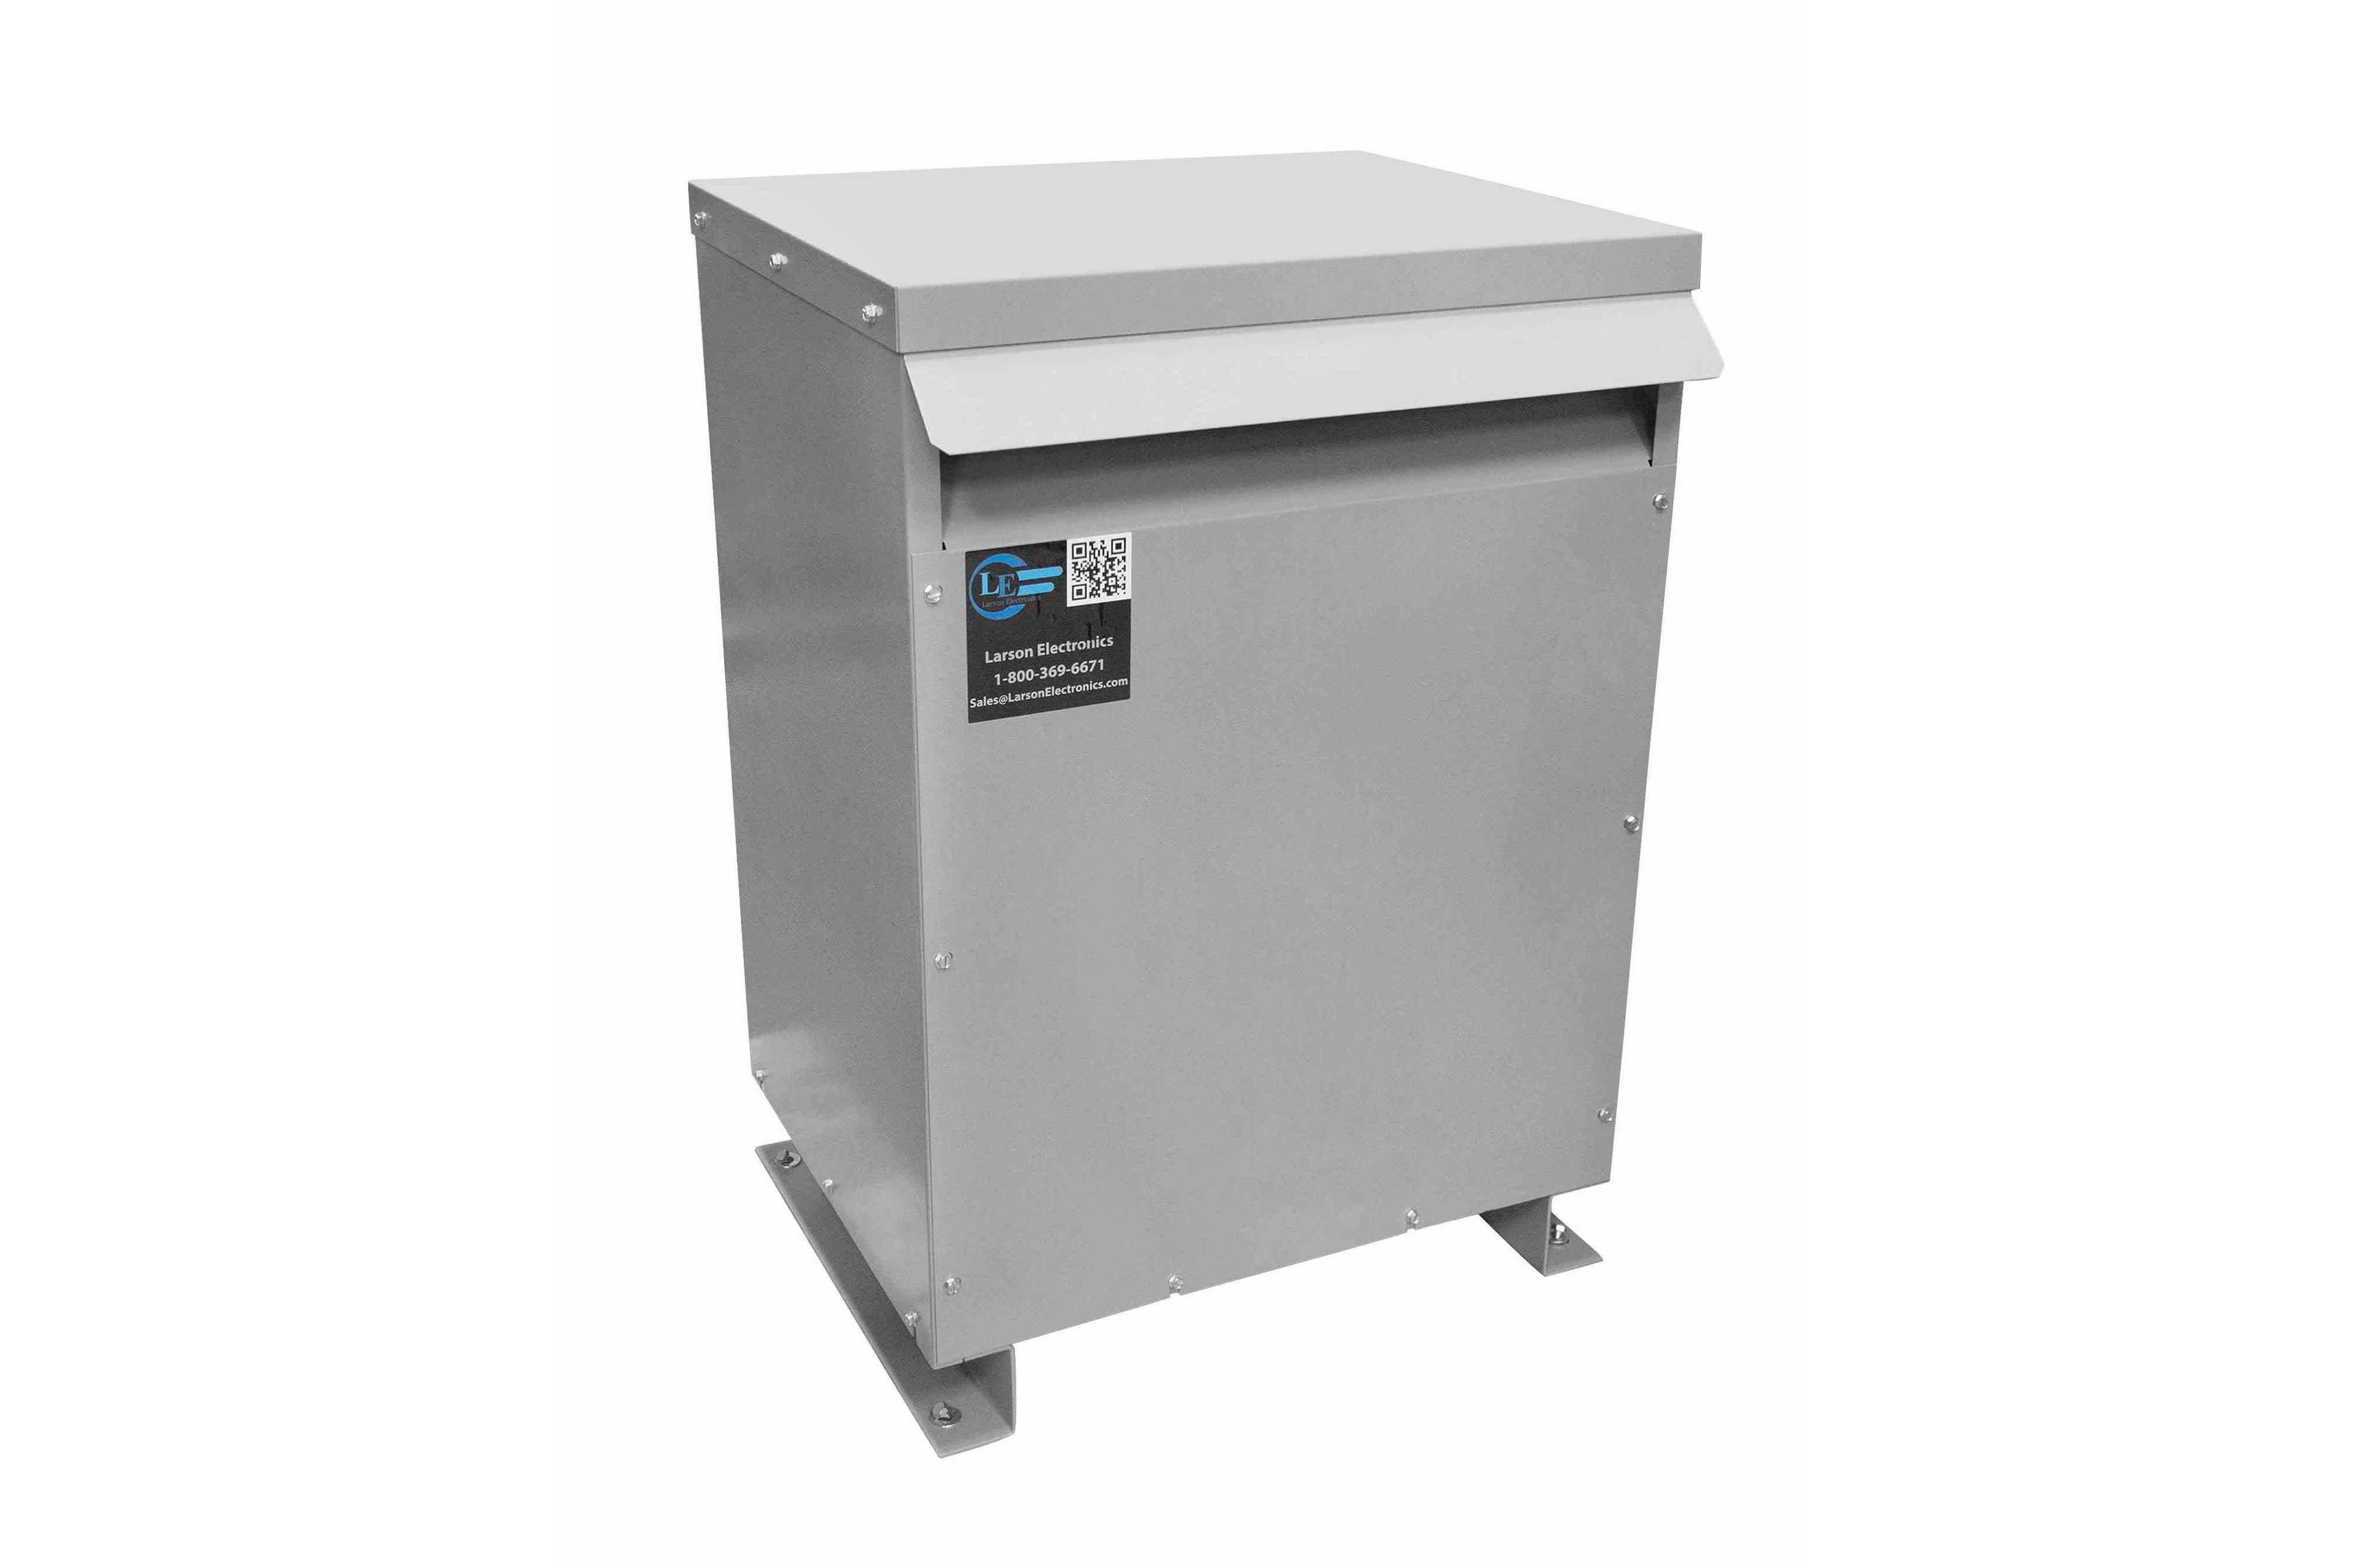 12 kVA 3PH Isolation Transformer, 220V Wye Primary, 208Y/120 Wye-N Secondary, N3R, Ventilated, 60 Hz